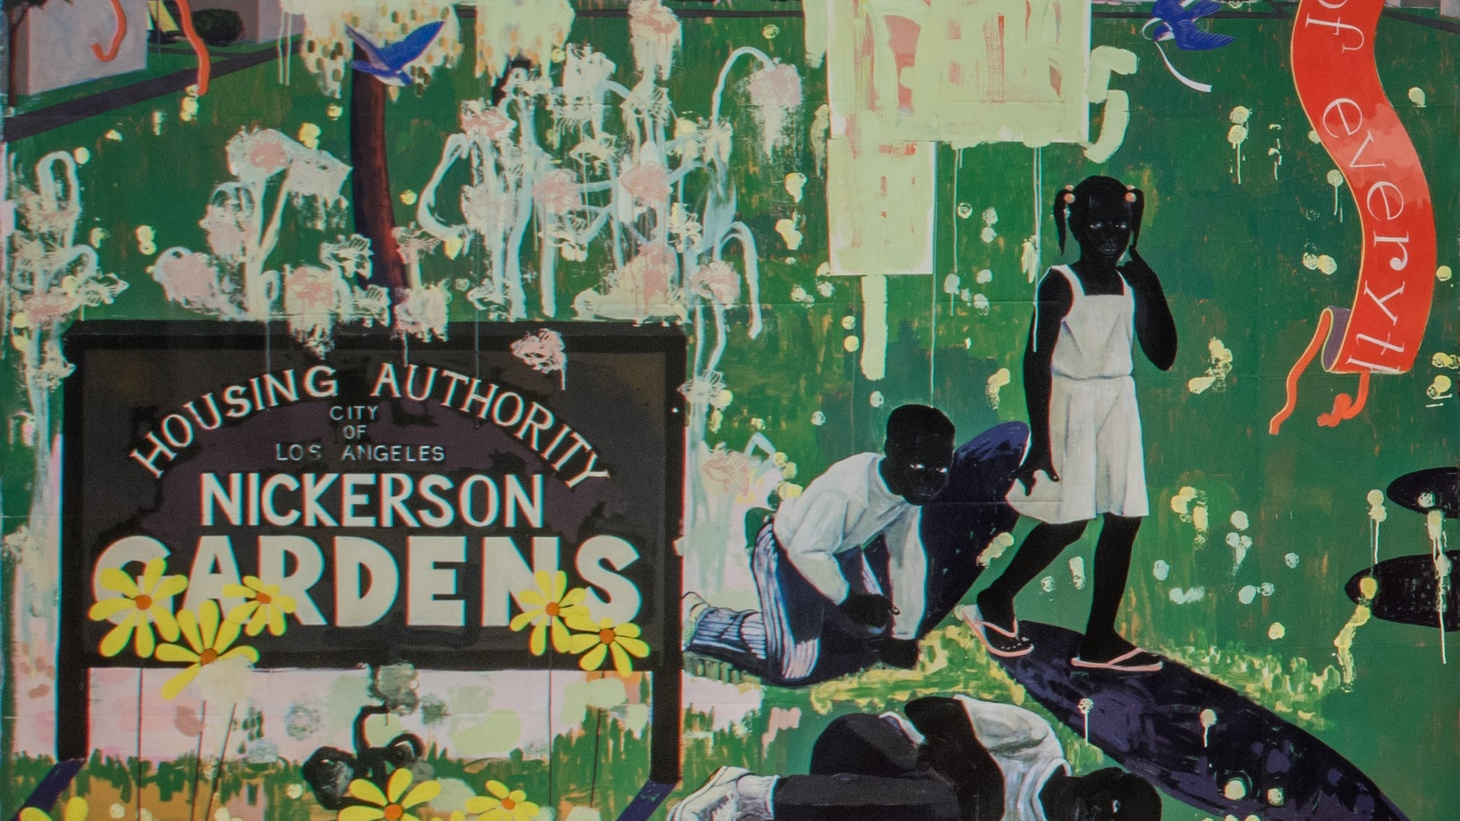 Hunter Drohojowska-Philp welcomes the retrospective of the black artist who got his start in LA.